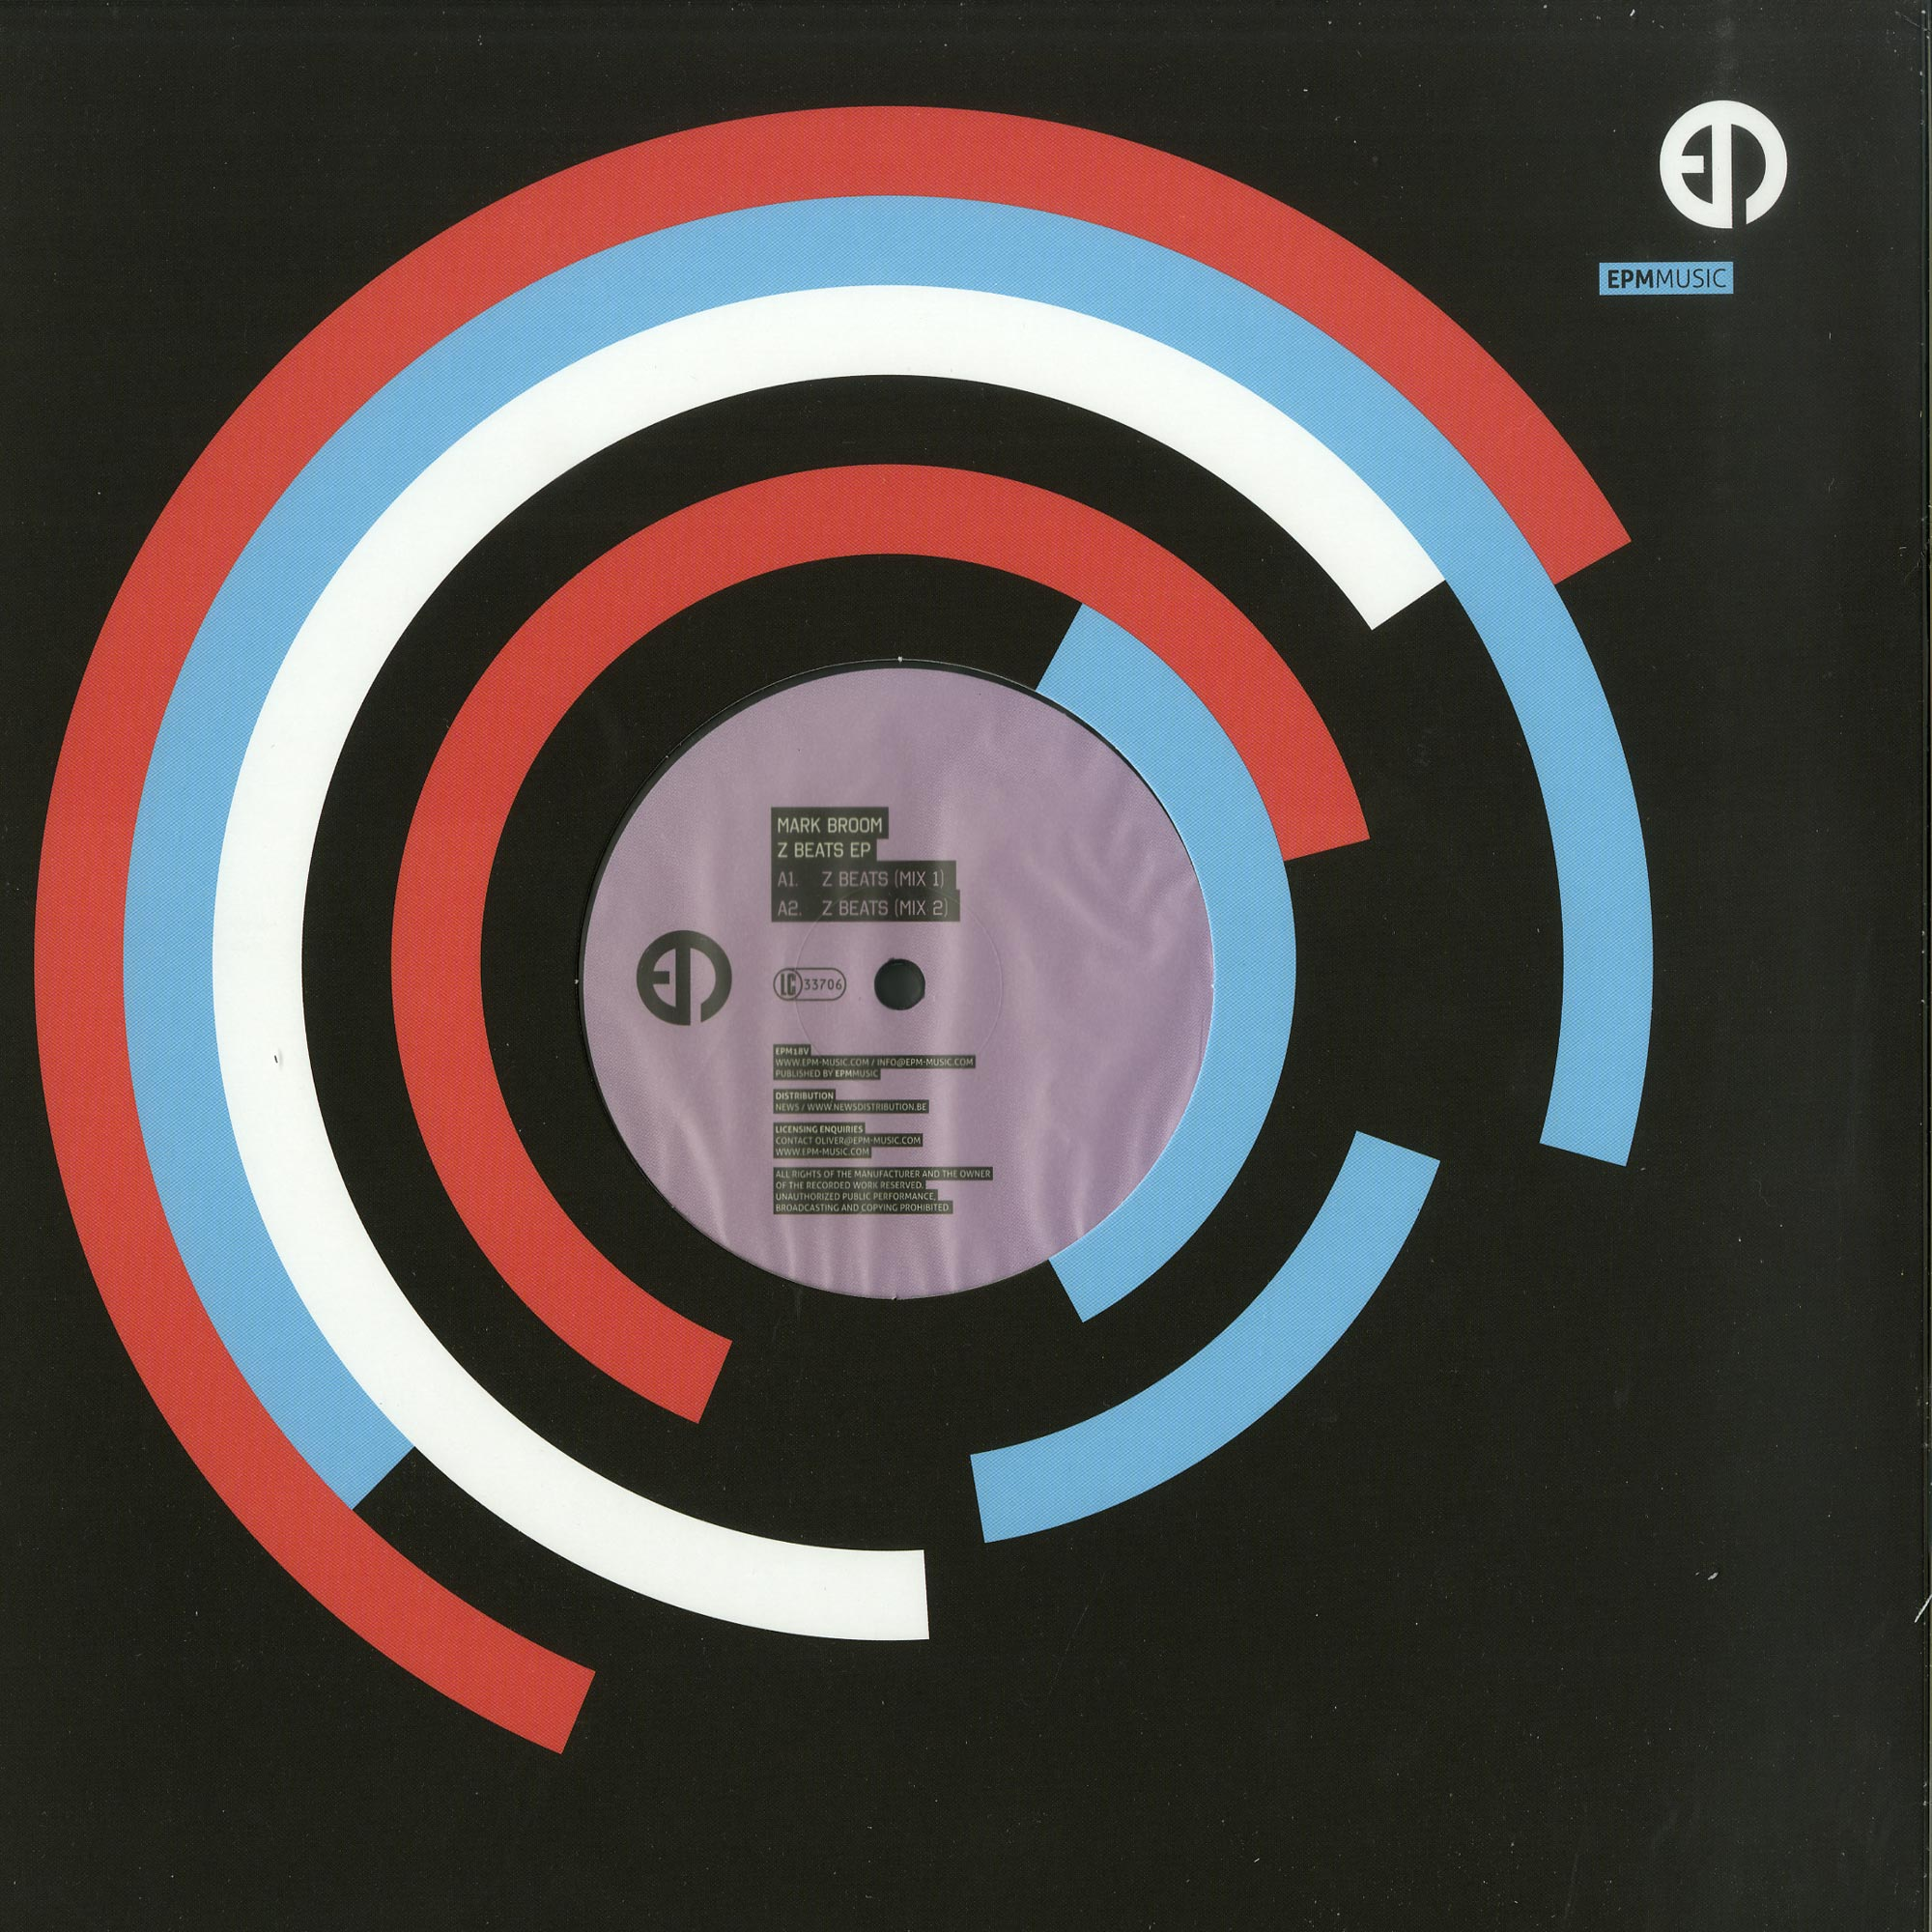 Mark Broom - Z BEATS EP